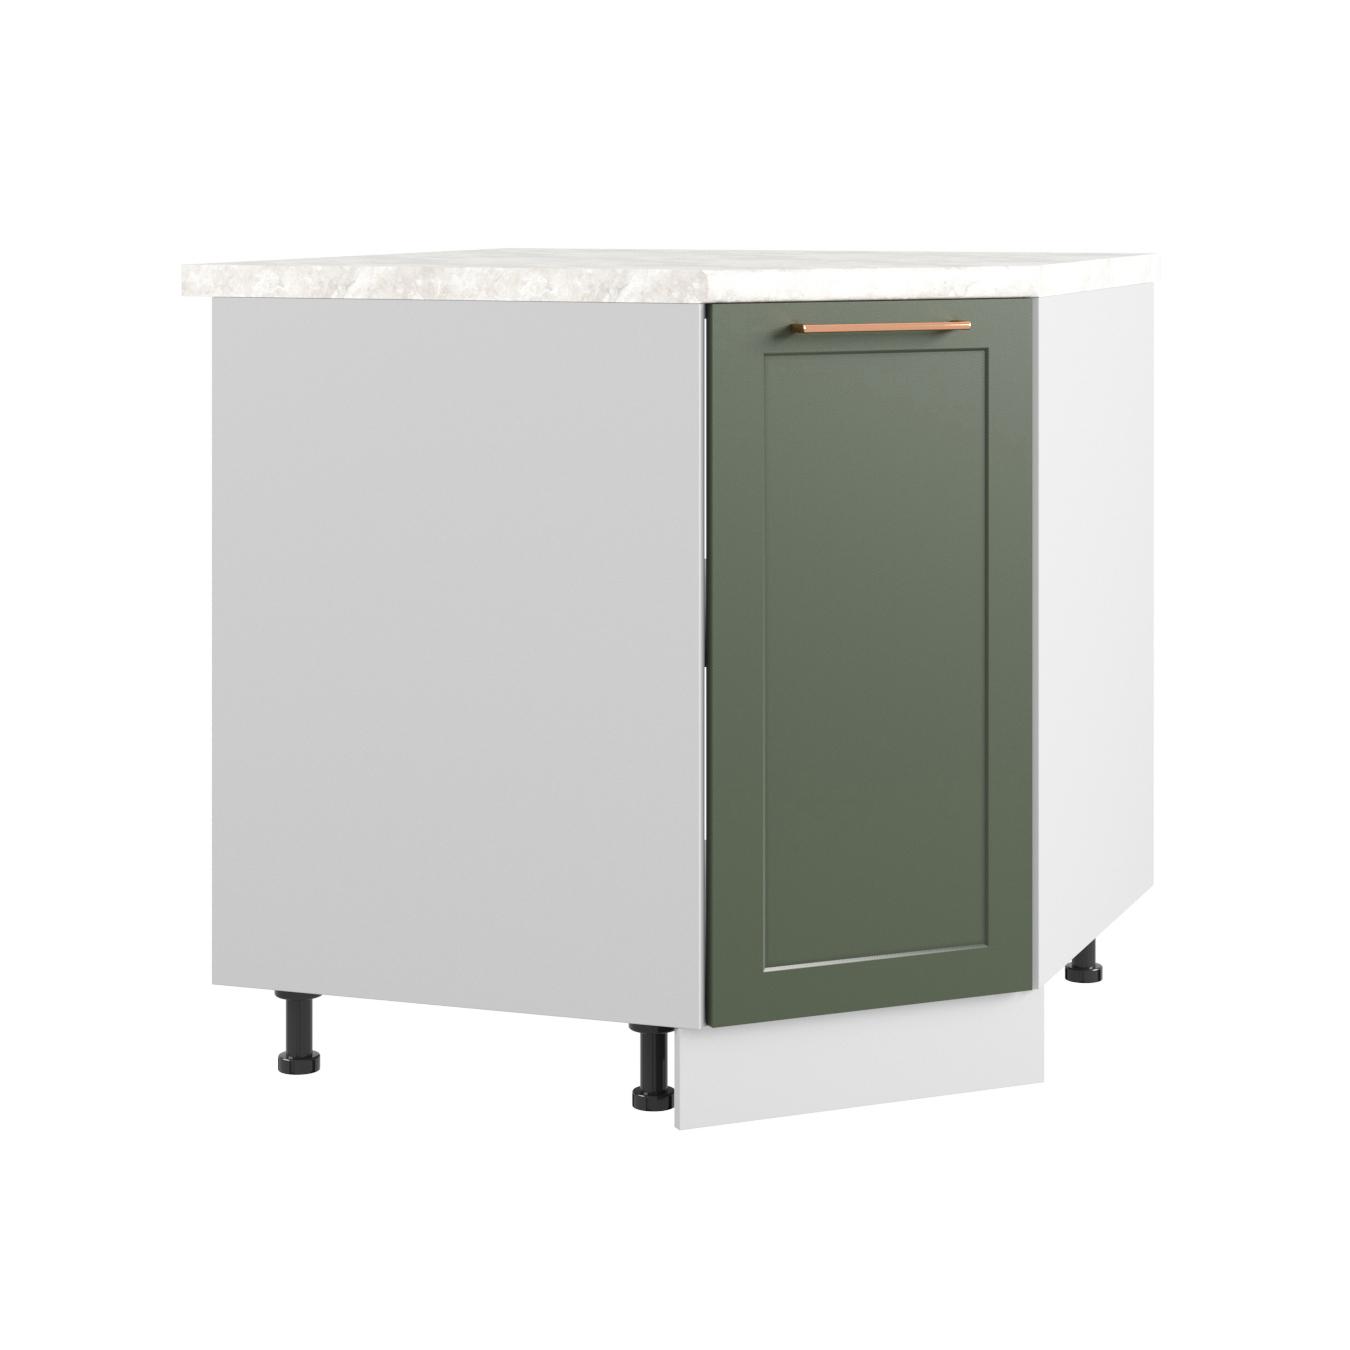 Кухня Квадро СУ 850 Шкаф нижний угловой